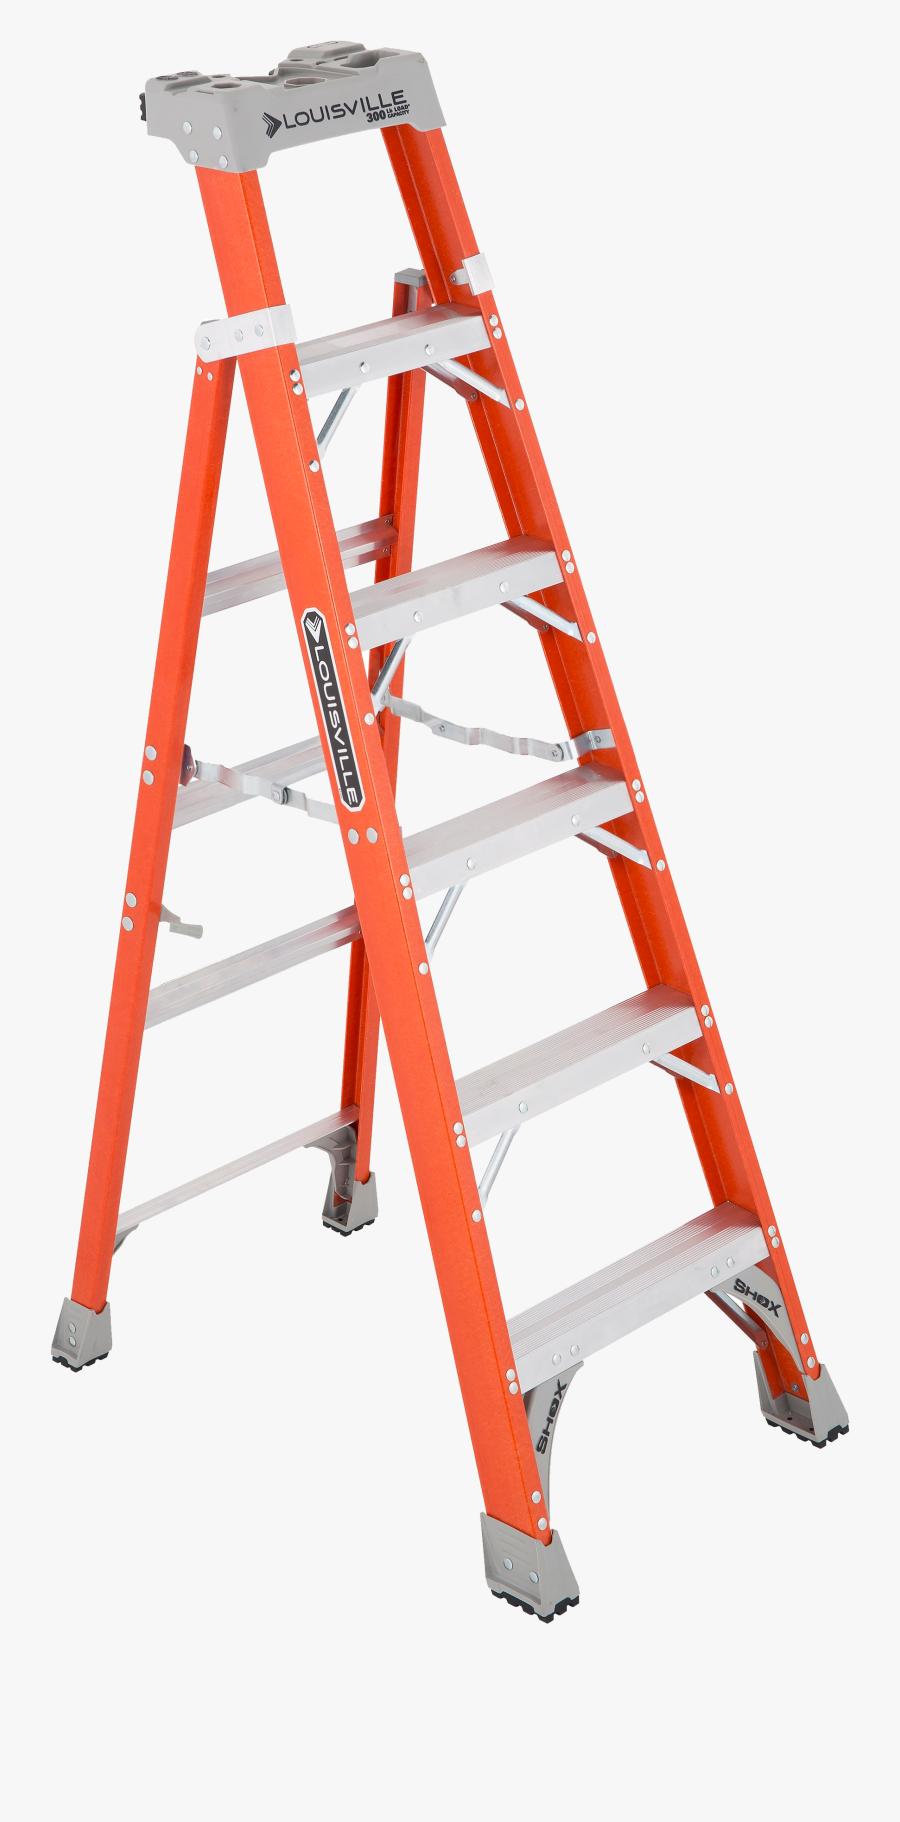 Transparent Ladders Png - Louisville Cross Step Ladder, Transparent Clipart